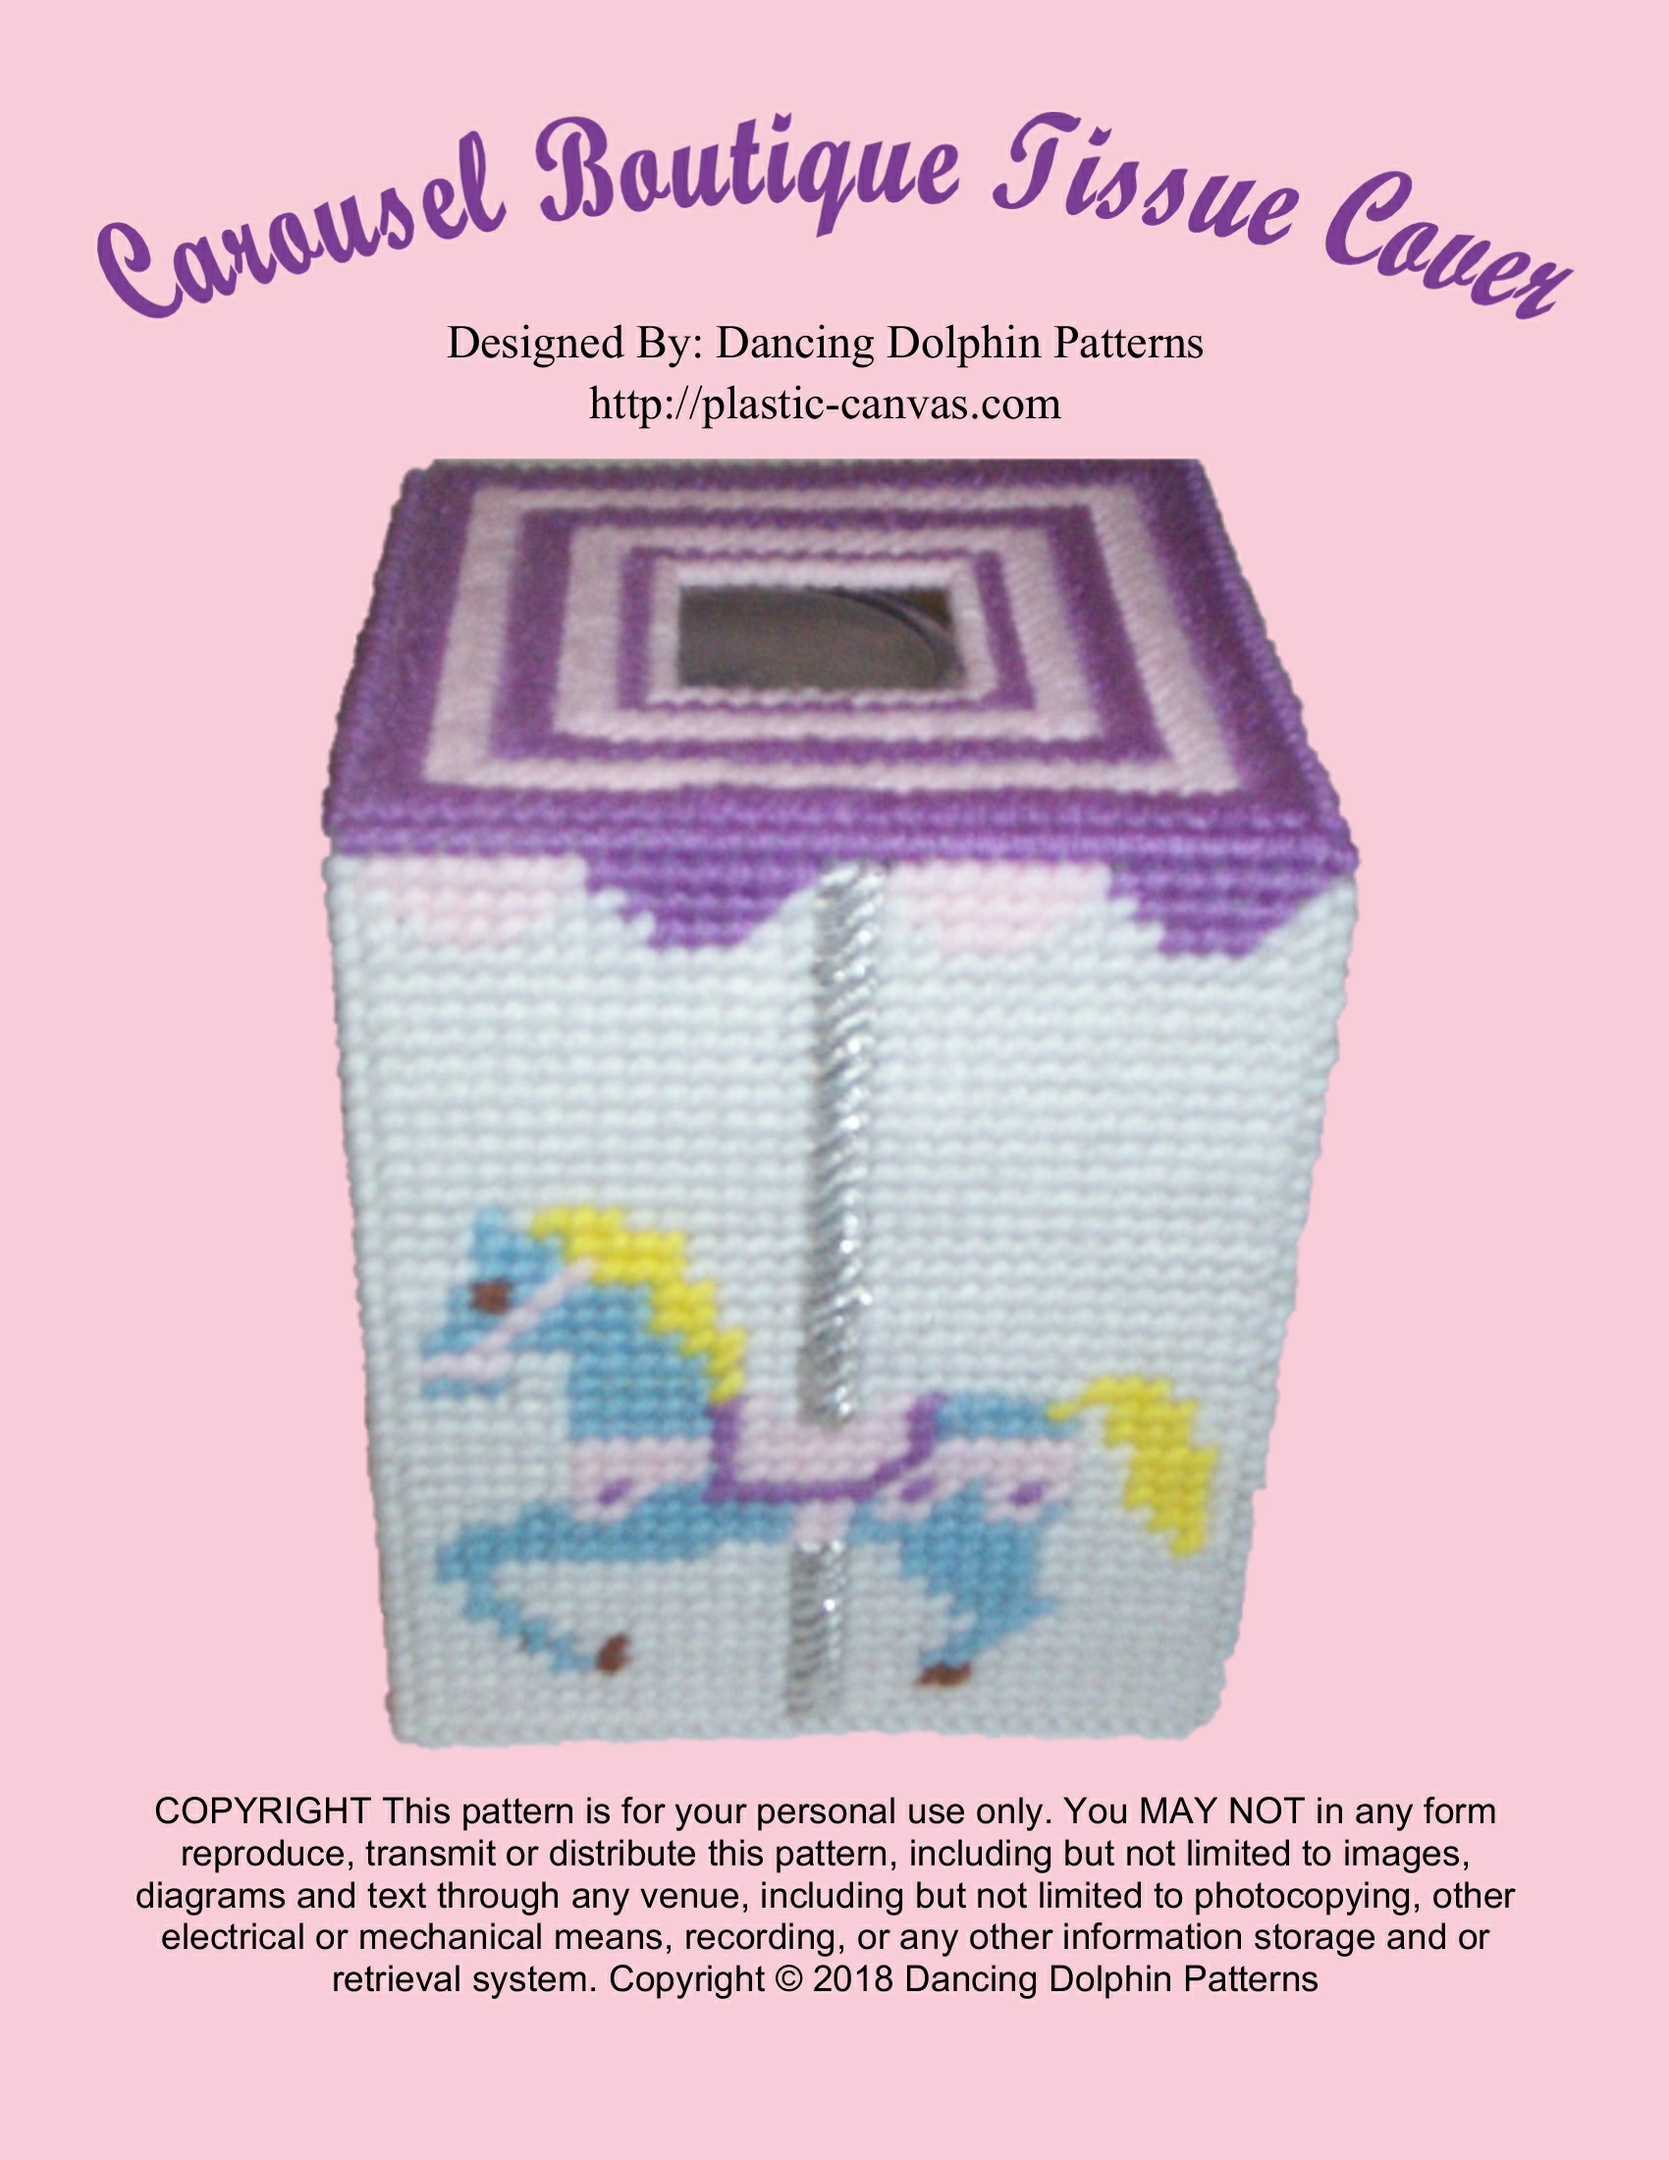 497 - Carousel Boutique Tissue Cover